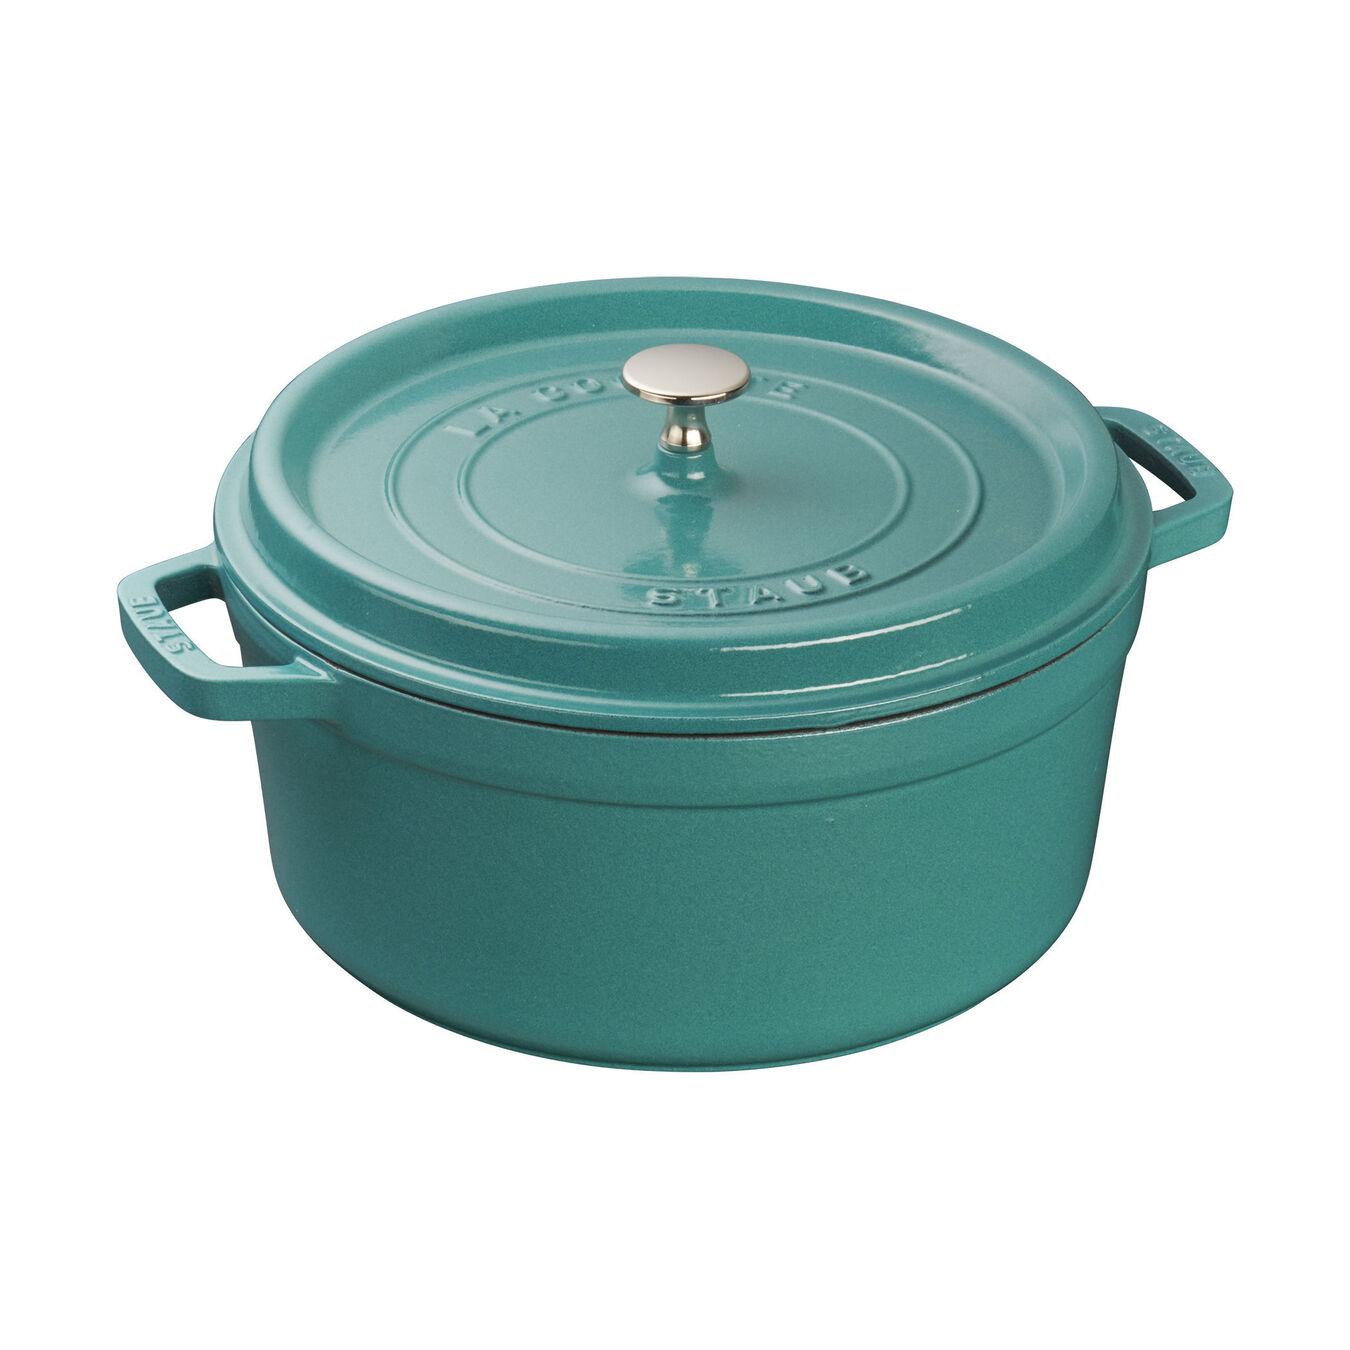 5.5-qt Round Cocotte - Turquoise,,large 1